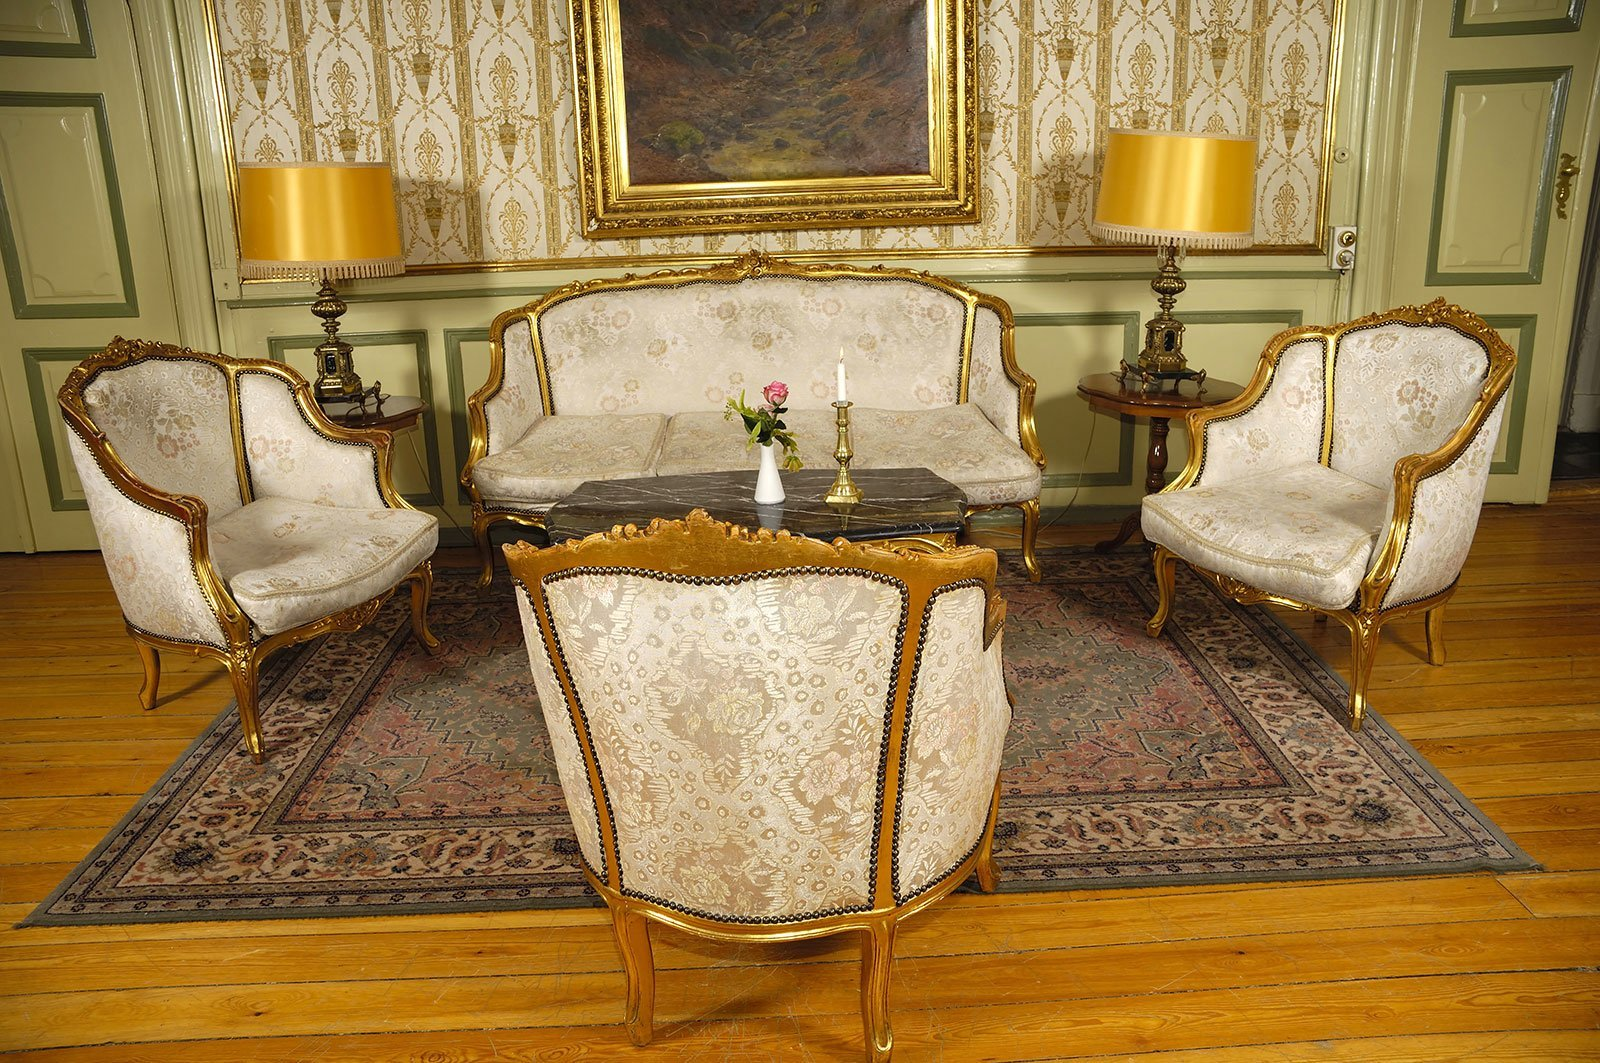 Elegante camera con mobili antichi